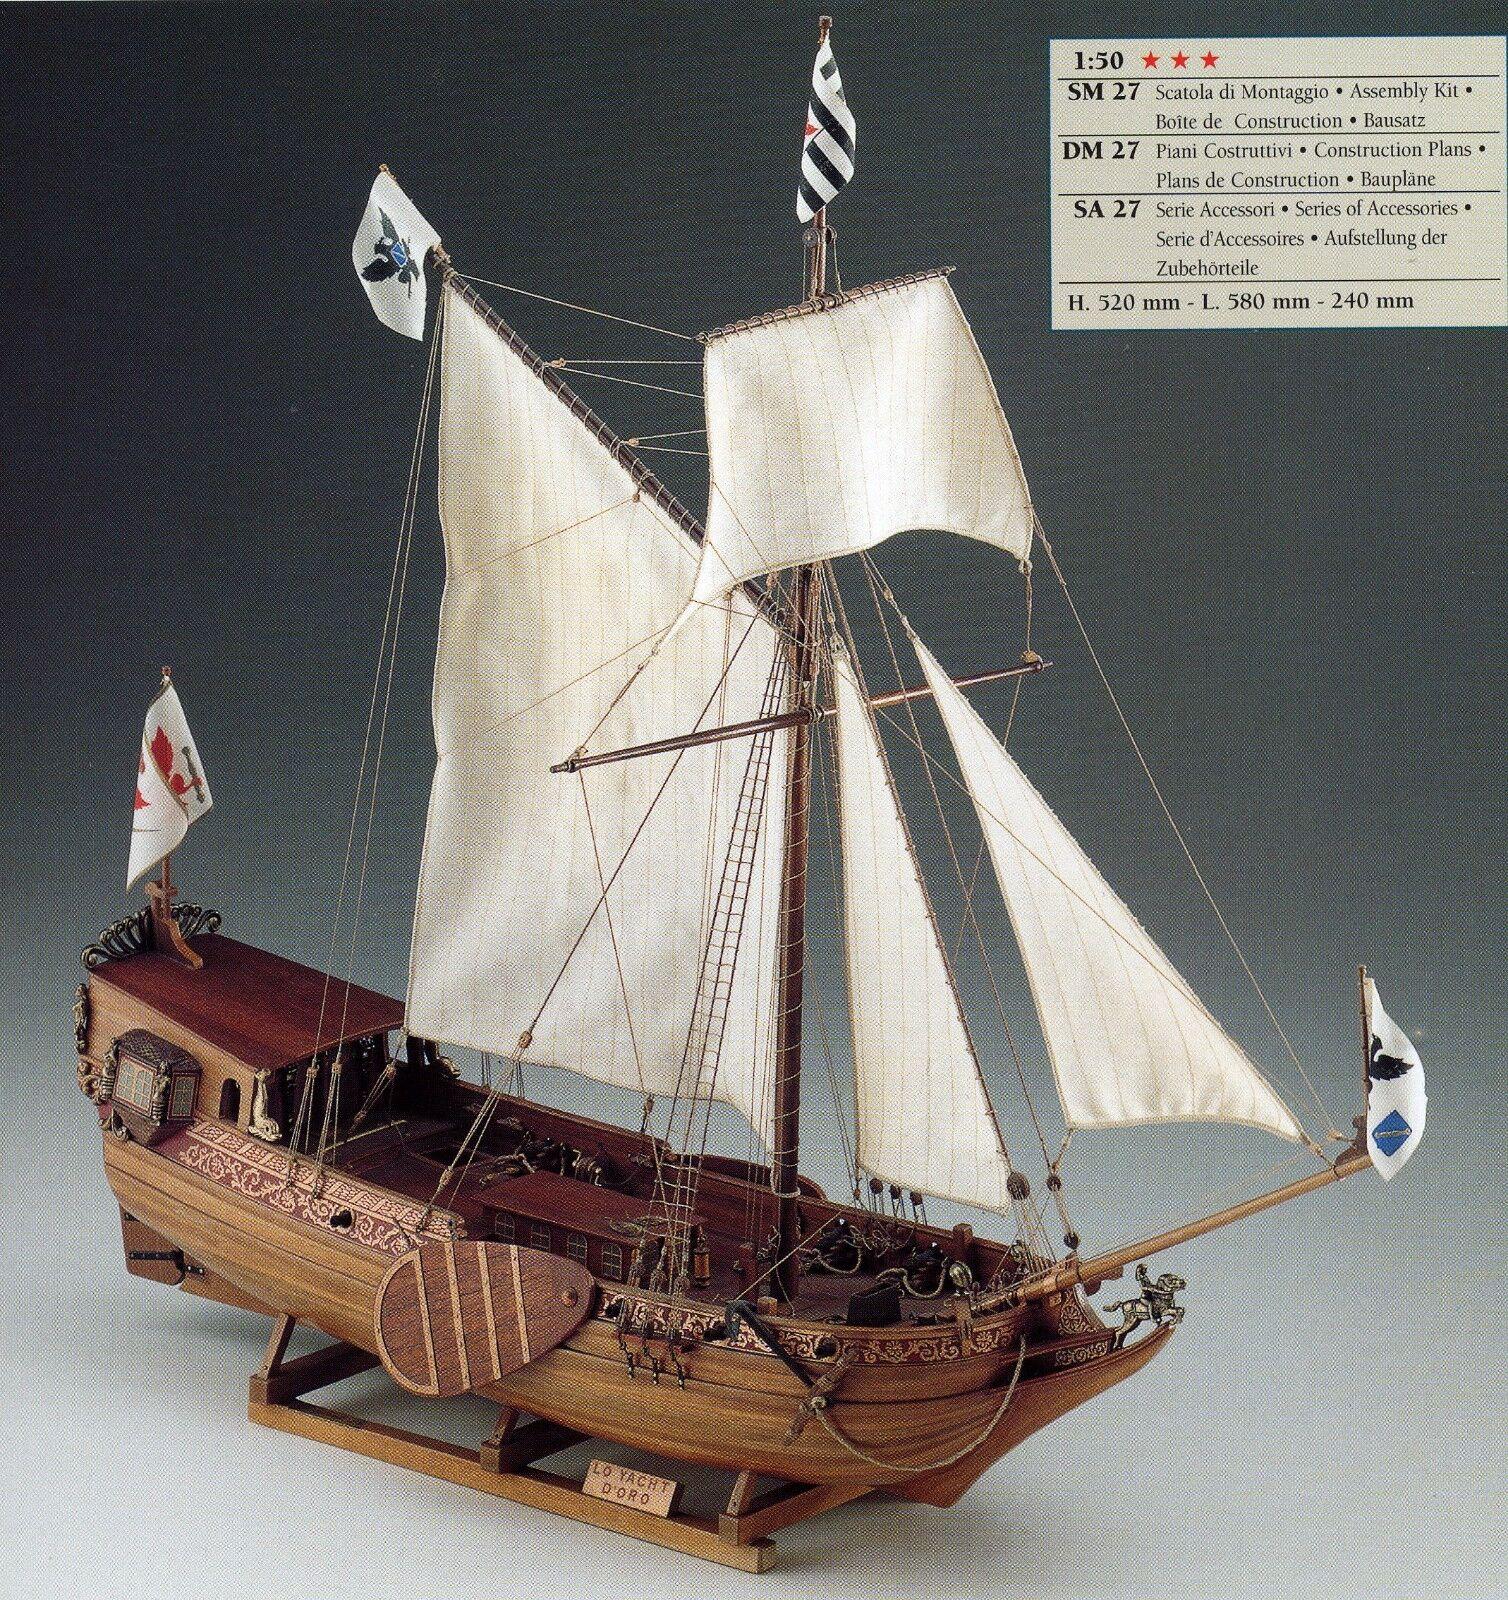 Corel sm27 Boat Model Yacht gold Boat Ship Brandenburger Scale 1 50